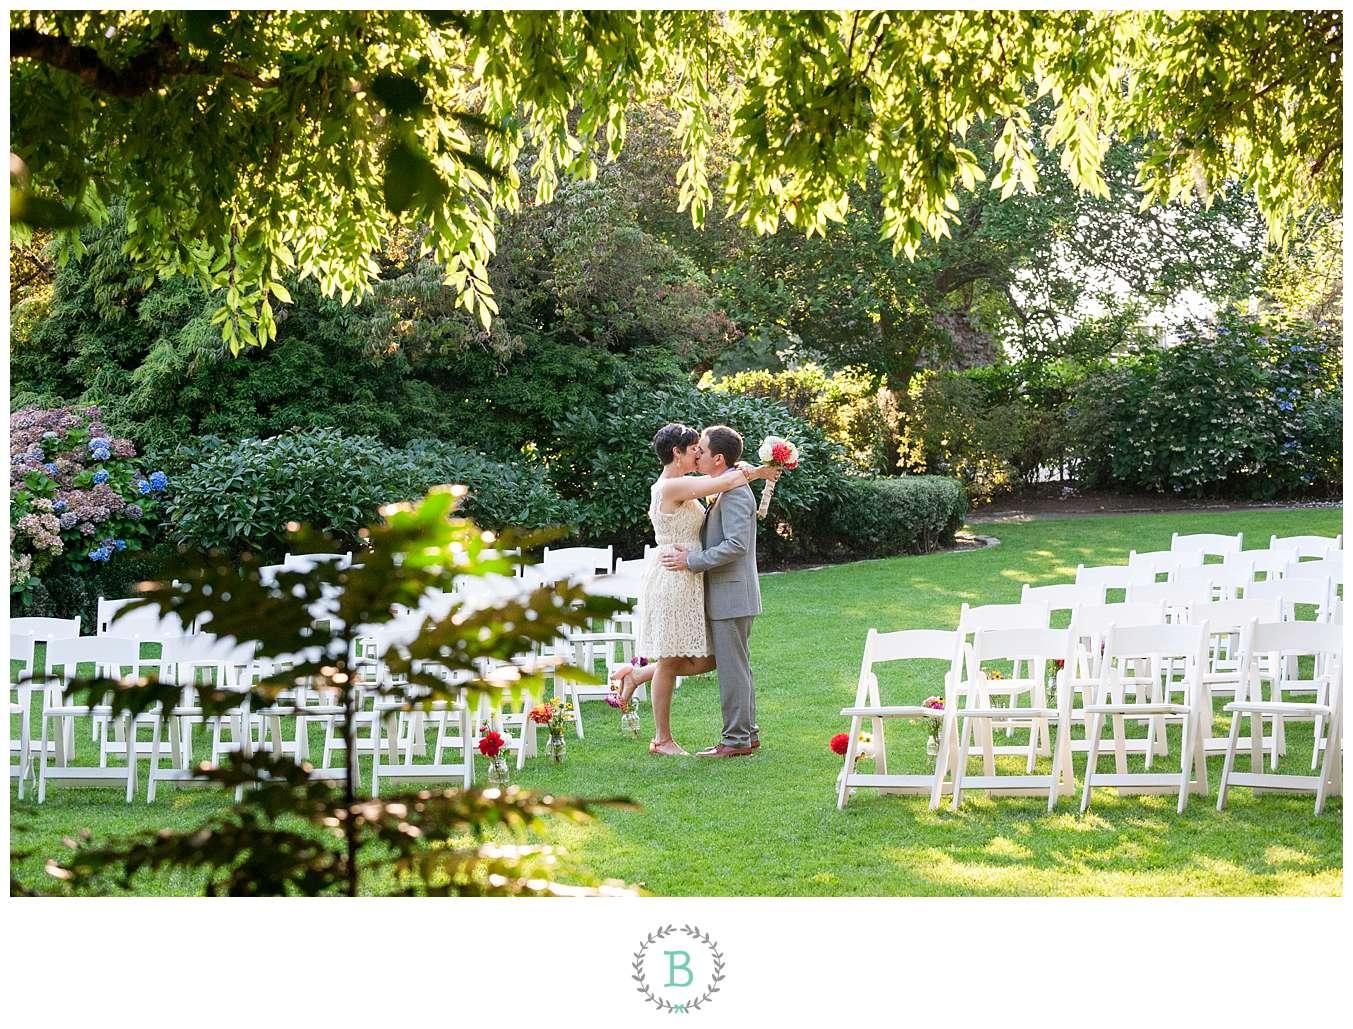 B-Jones-Photography-Seattle-Wedding-Photographer_0760.jpg